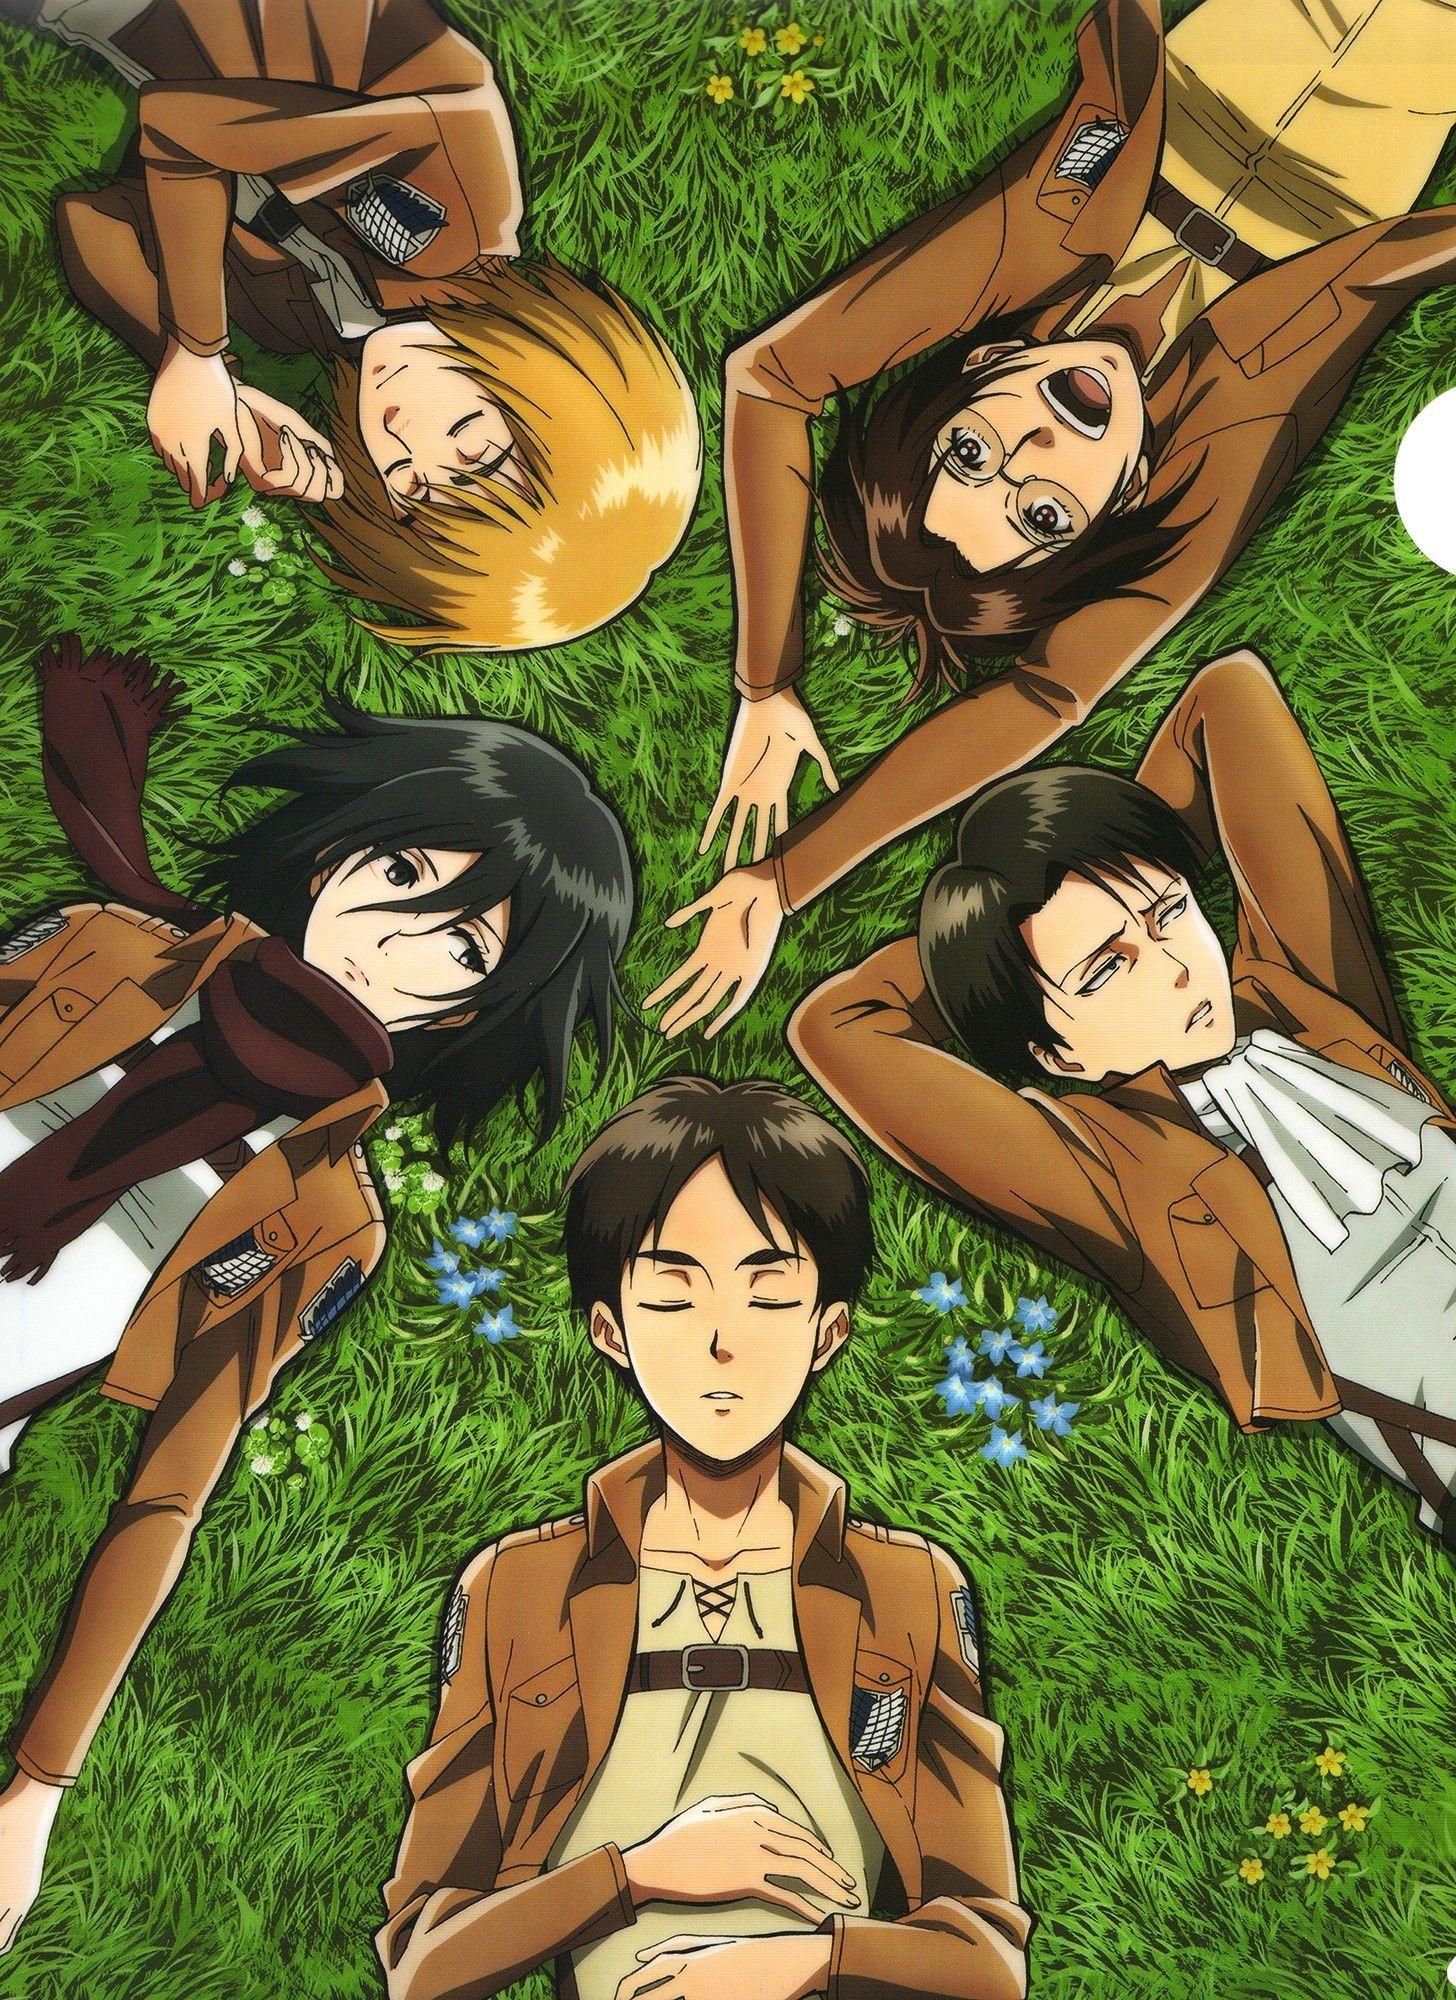 Armin Hanji Mikasa Rivaille And Eren Attack On Titan Anime Attack On Titan Titans Anime